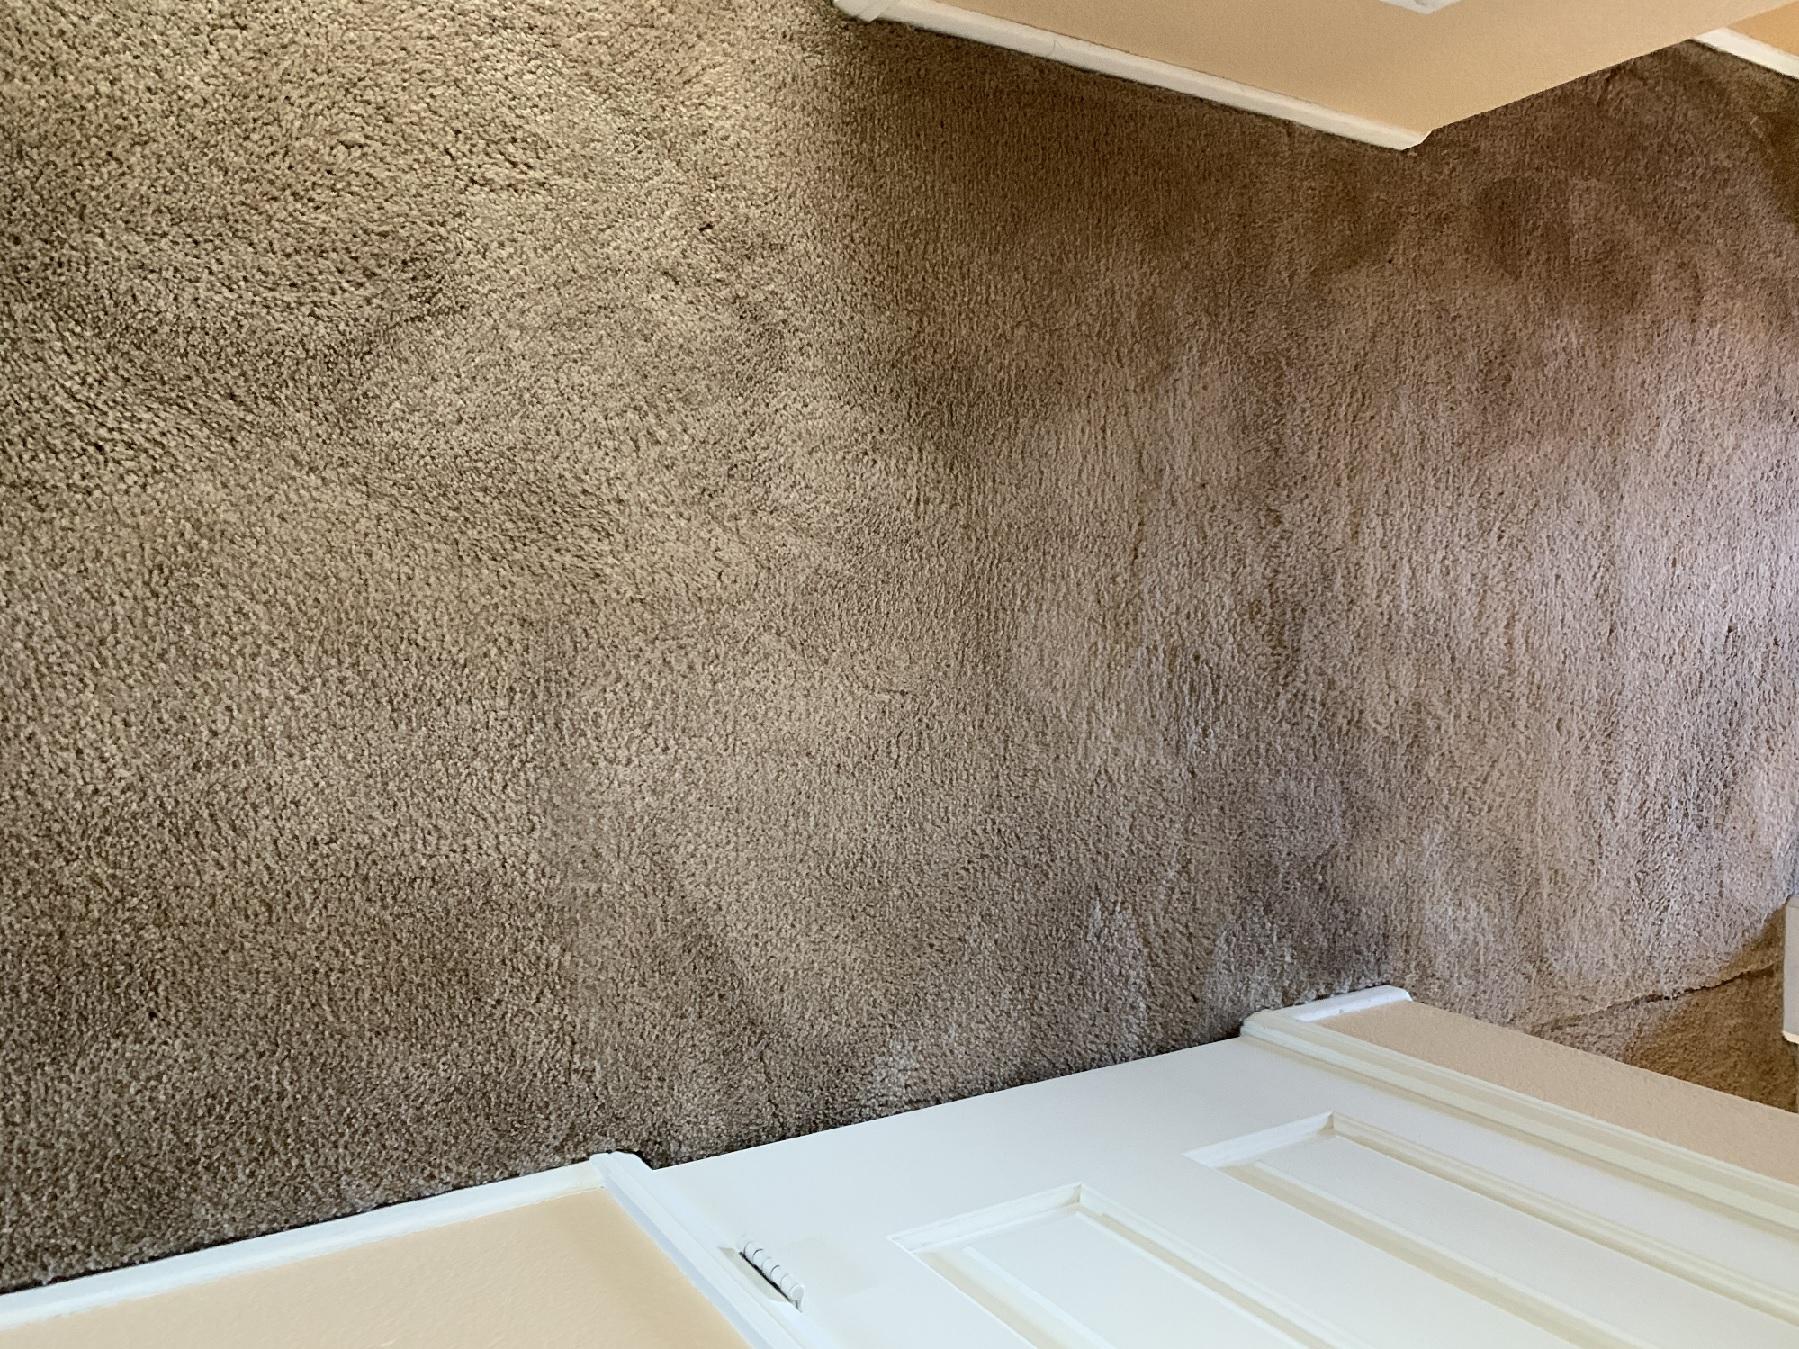 909 436 6080 1 Best Carpet Stretching Carpet Repair Carpet Stretching